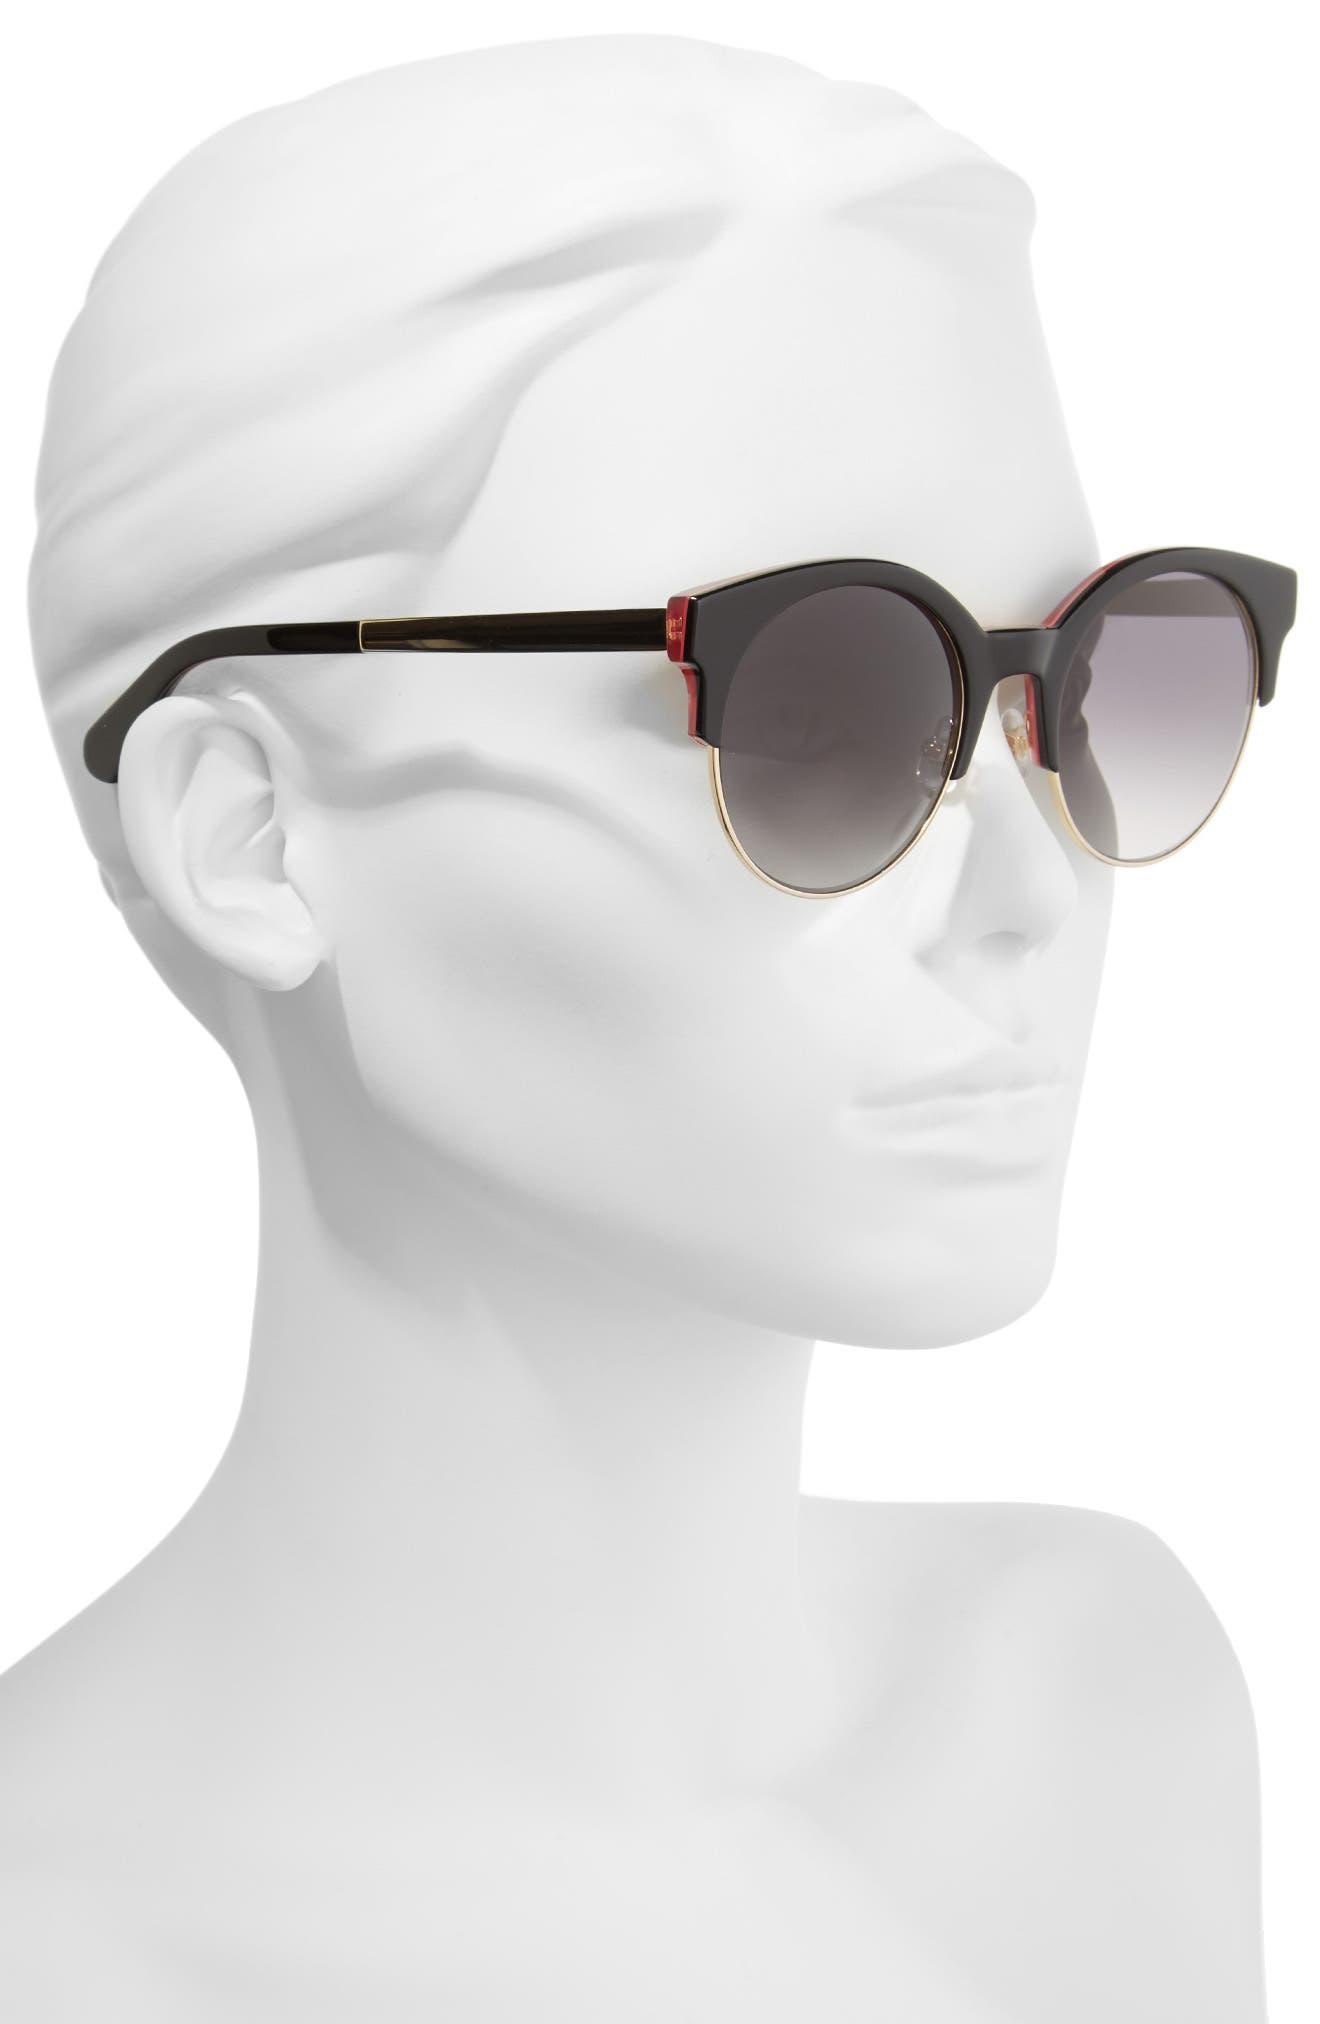 kaileen 52mm semi-rimless cat eye sunglasses,                             Alternate thumbnail 2, color,                             001